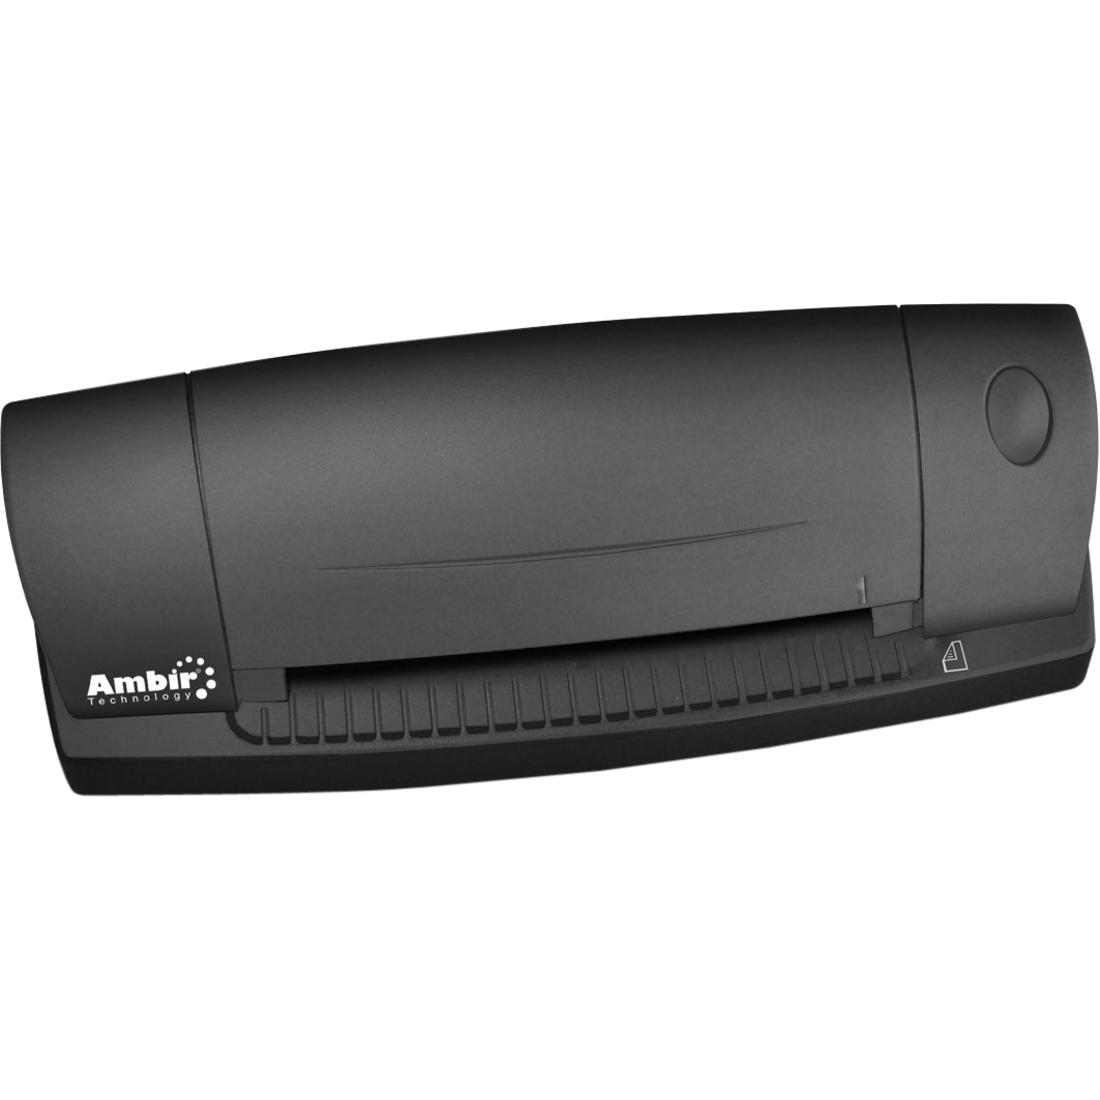 Ambir DS687-A3P Duplex ID Color Card Scanner